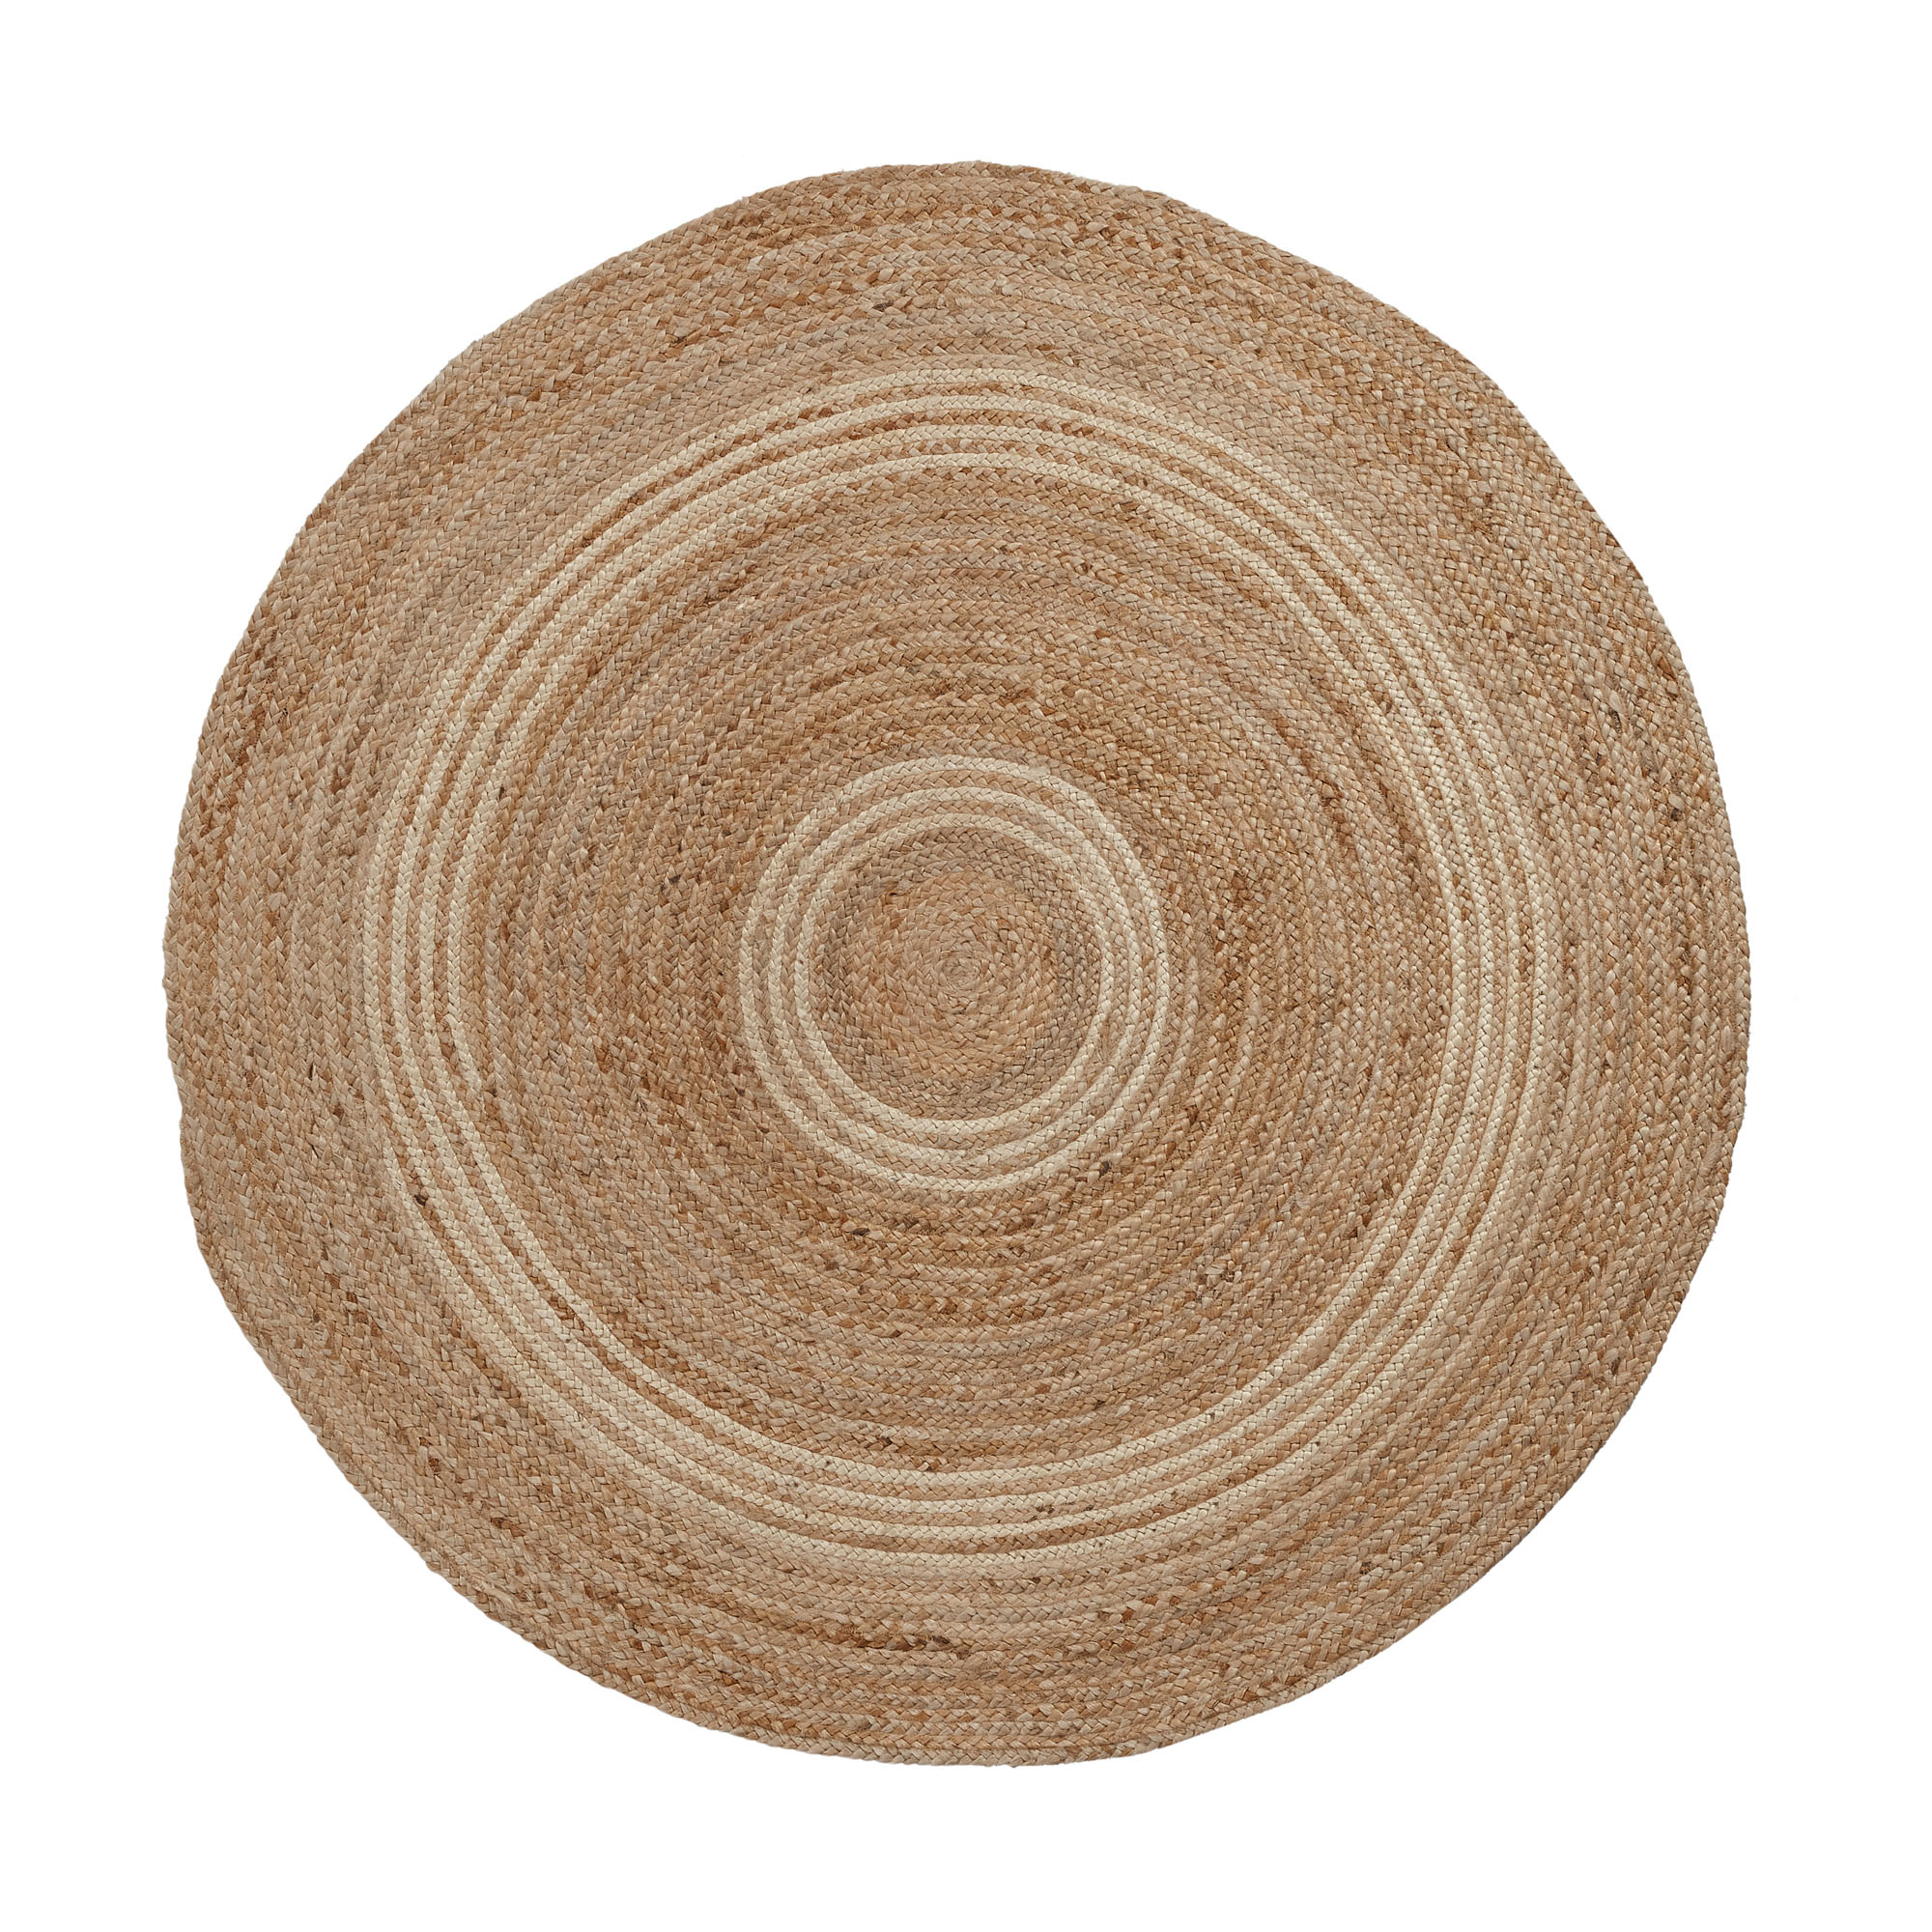 Kave home - tapis saht Ø150 cm naturel